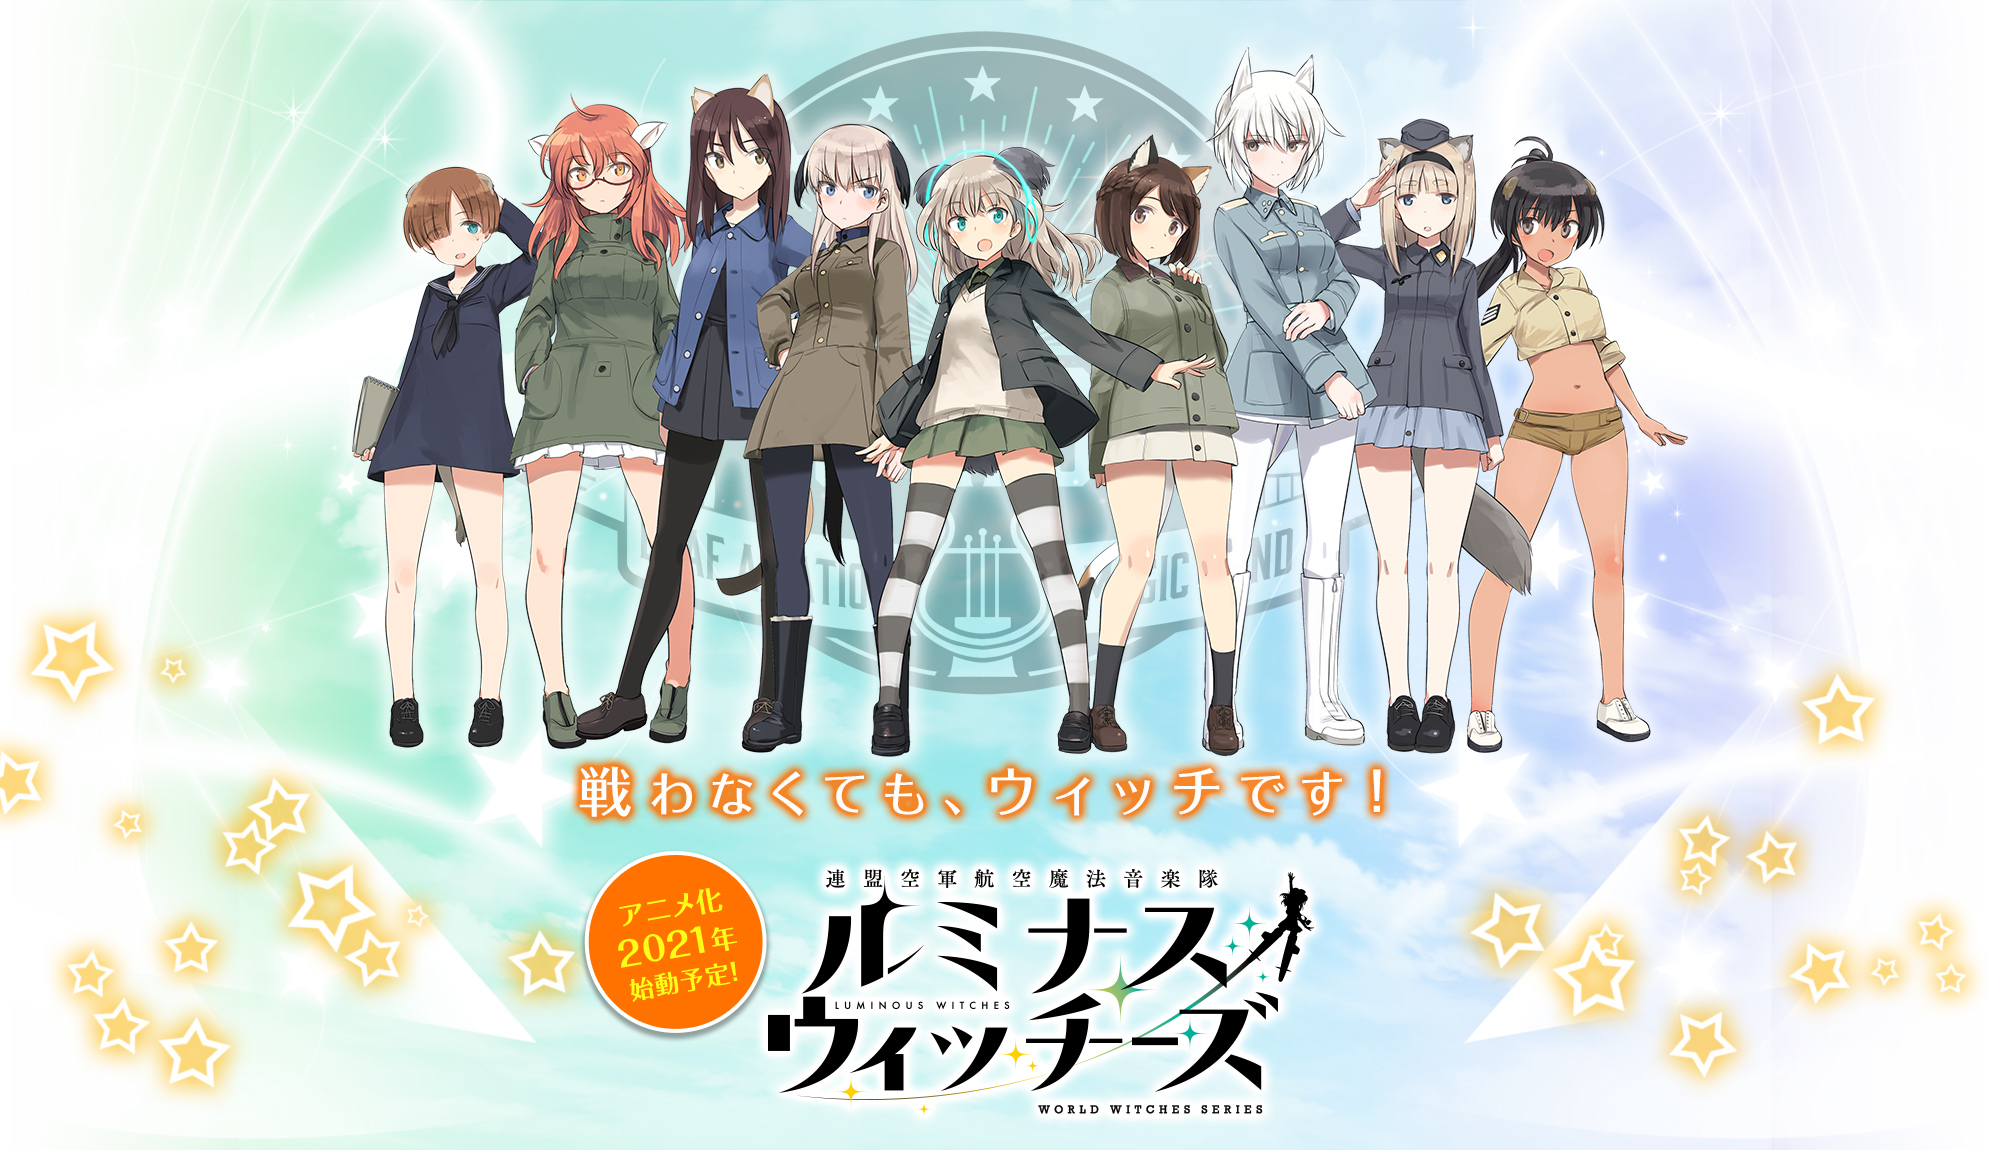 Kyō Tachibana se une al elenco del anime Renmei Kūgun Kōkū Mahō Ongakutai Luminous Witches